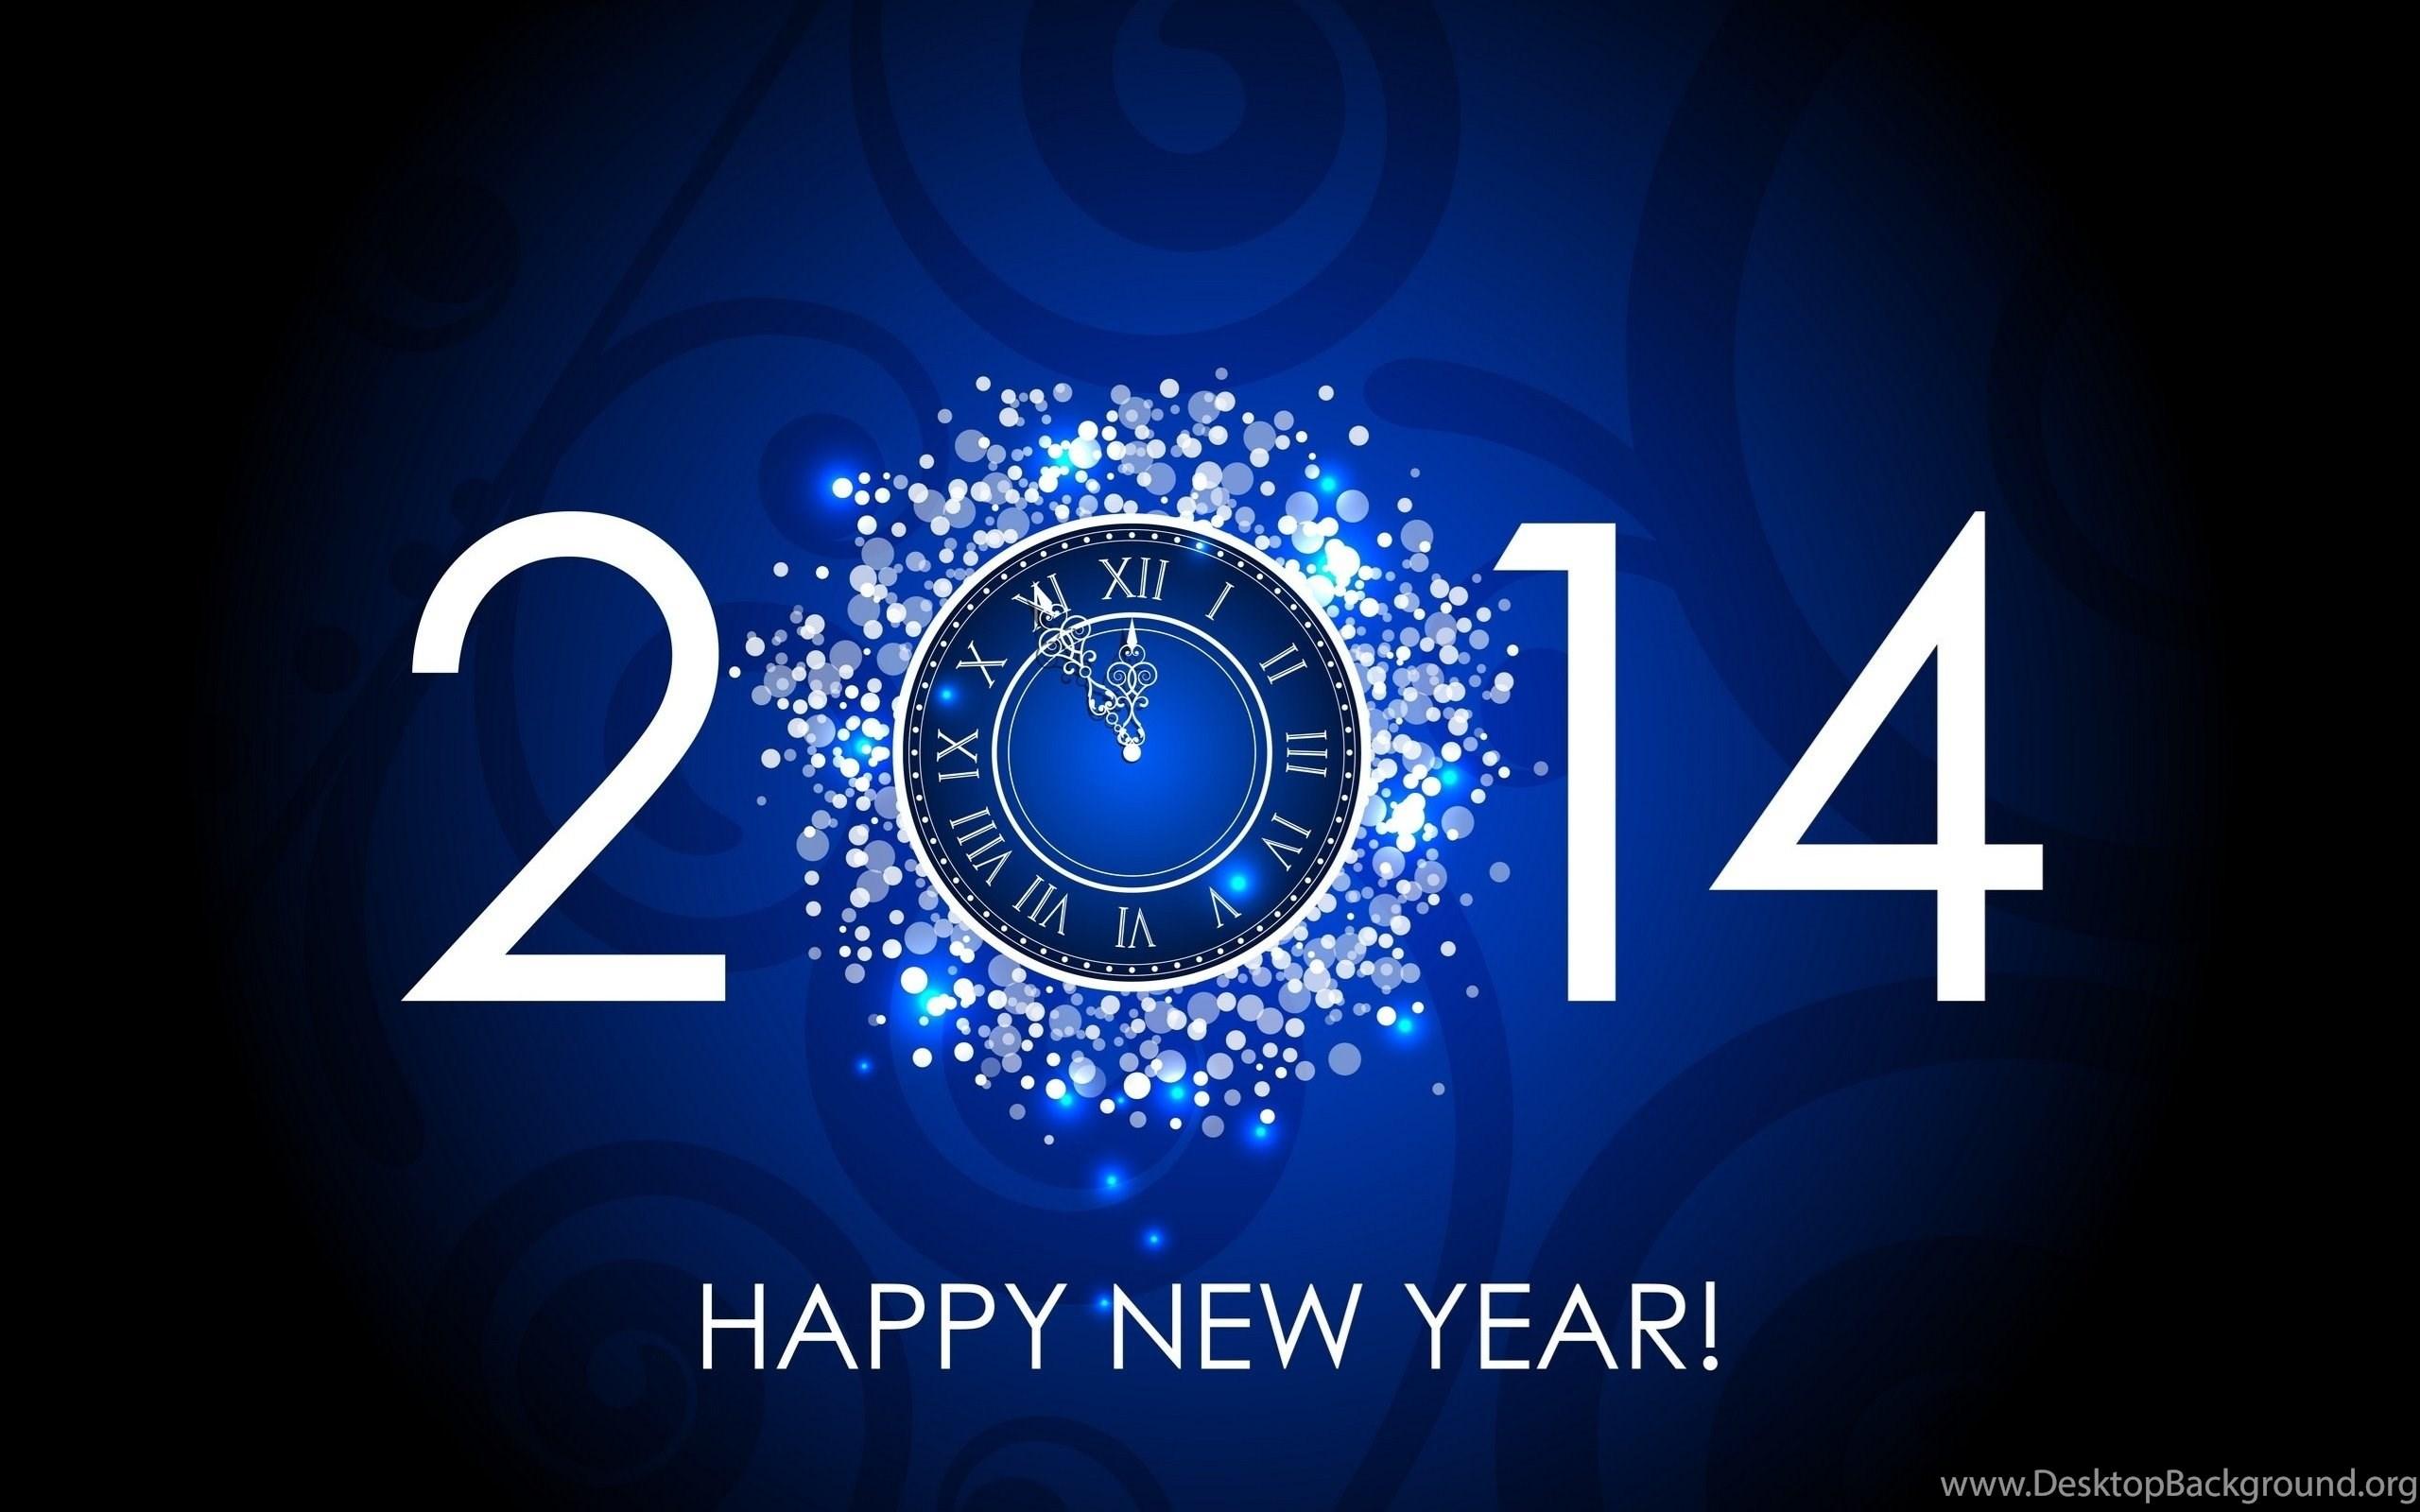 happy new year hd wallpaper download 16 desktop background